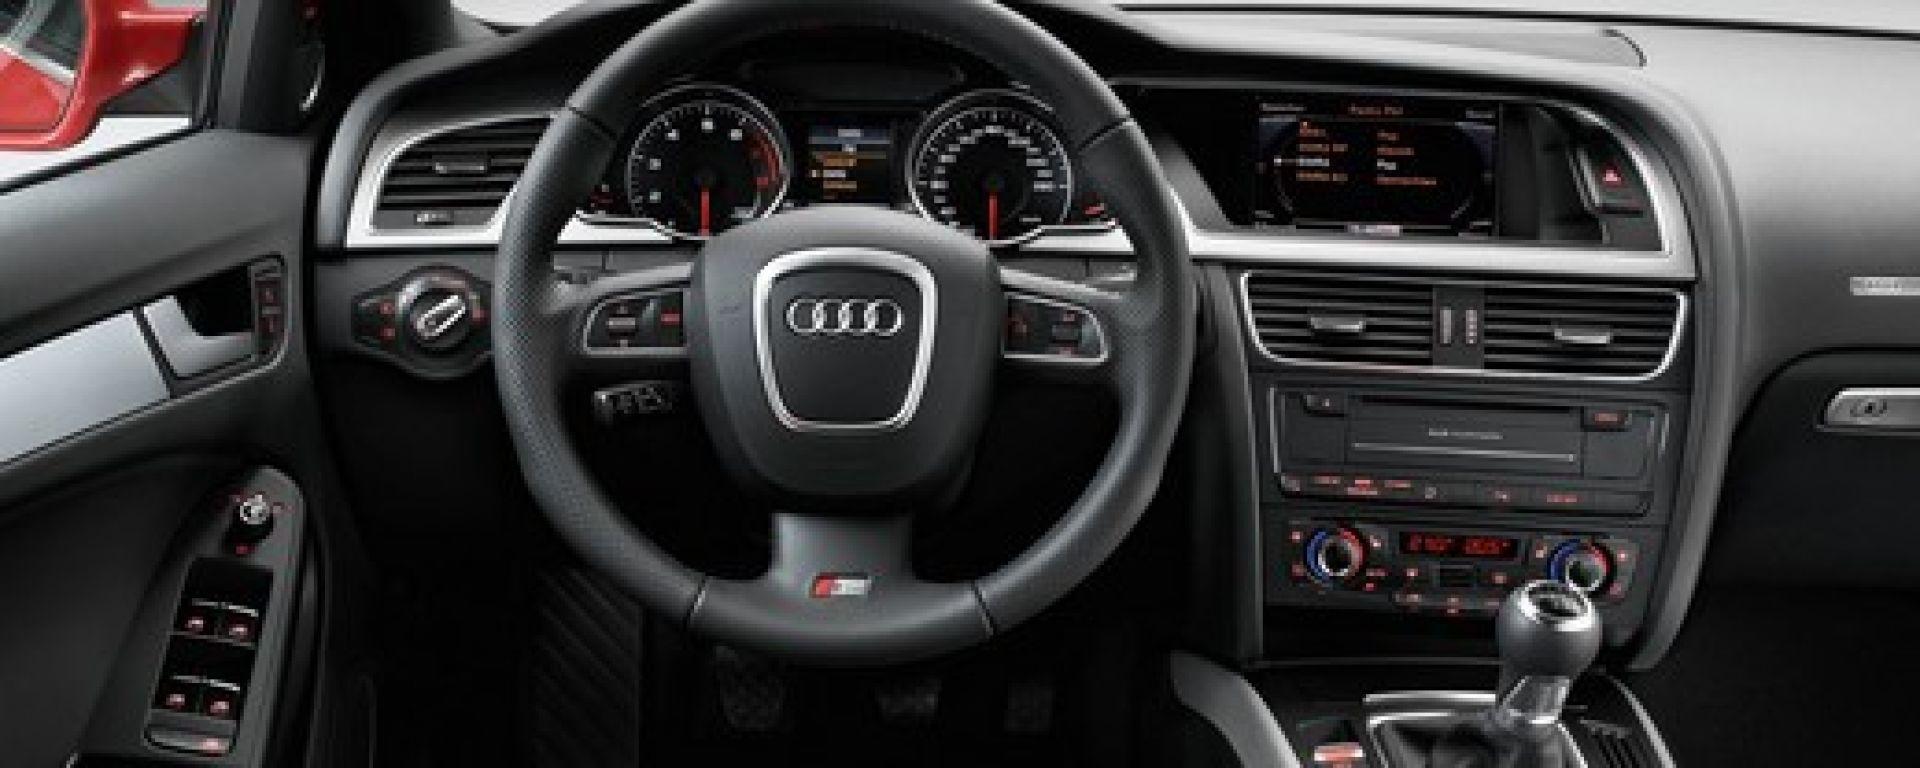 Prova Audi A5 Sportback Motorbox